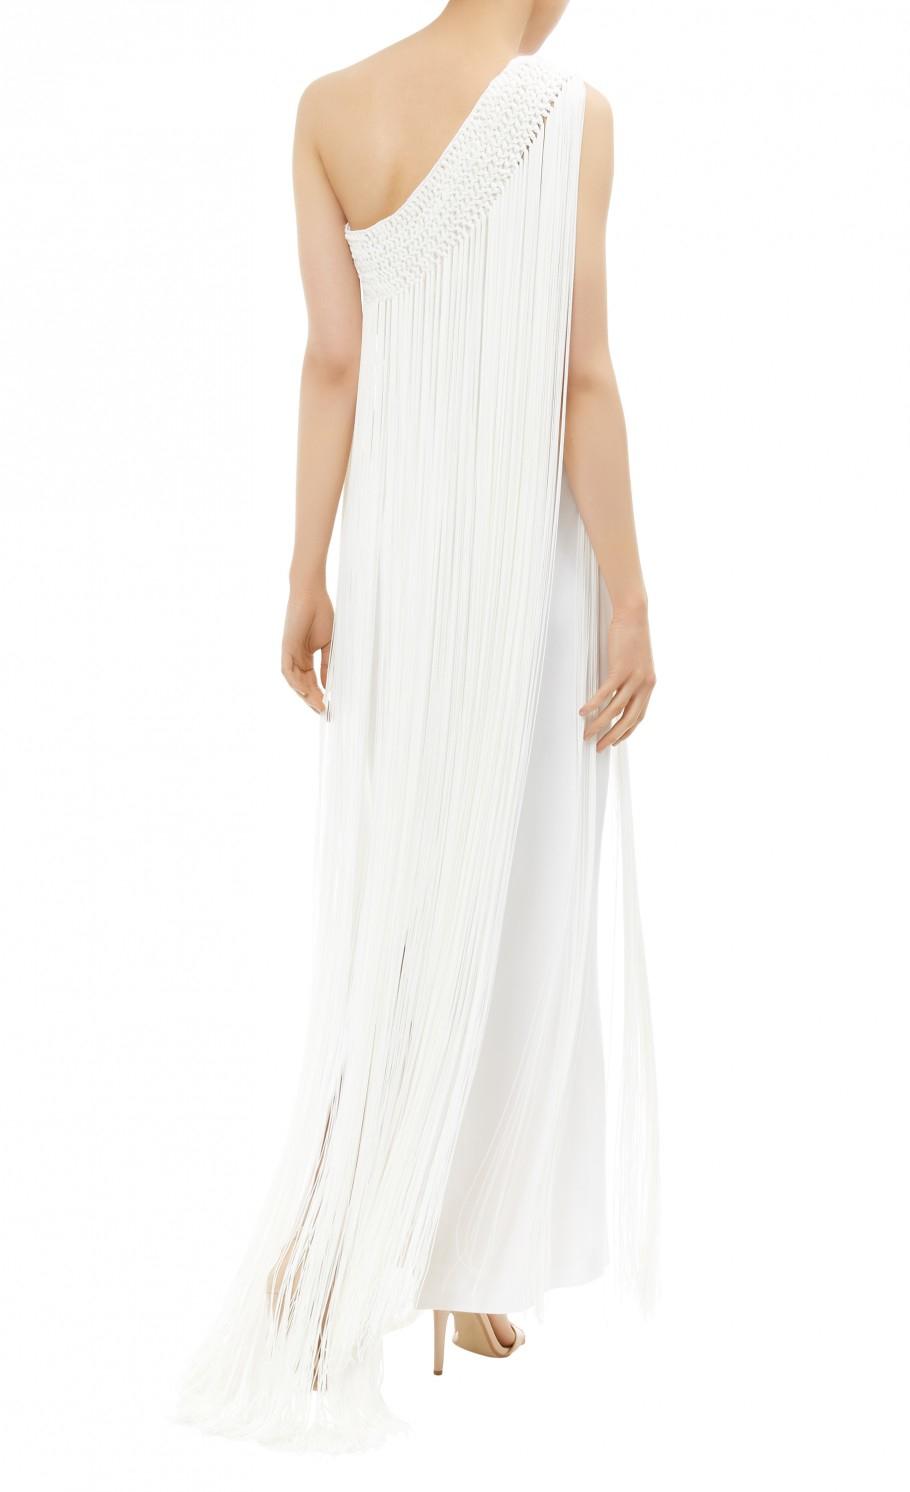 Temperley London Damara Fringed Silk Dress In White Lyst